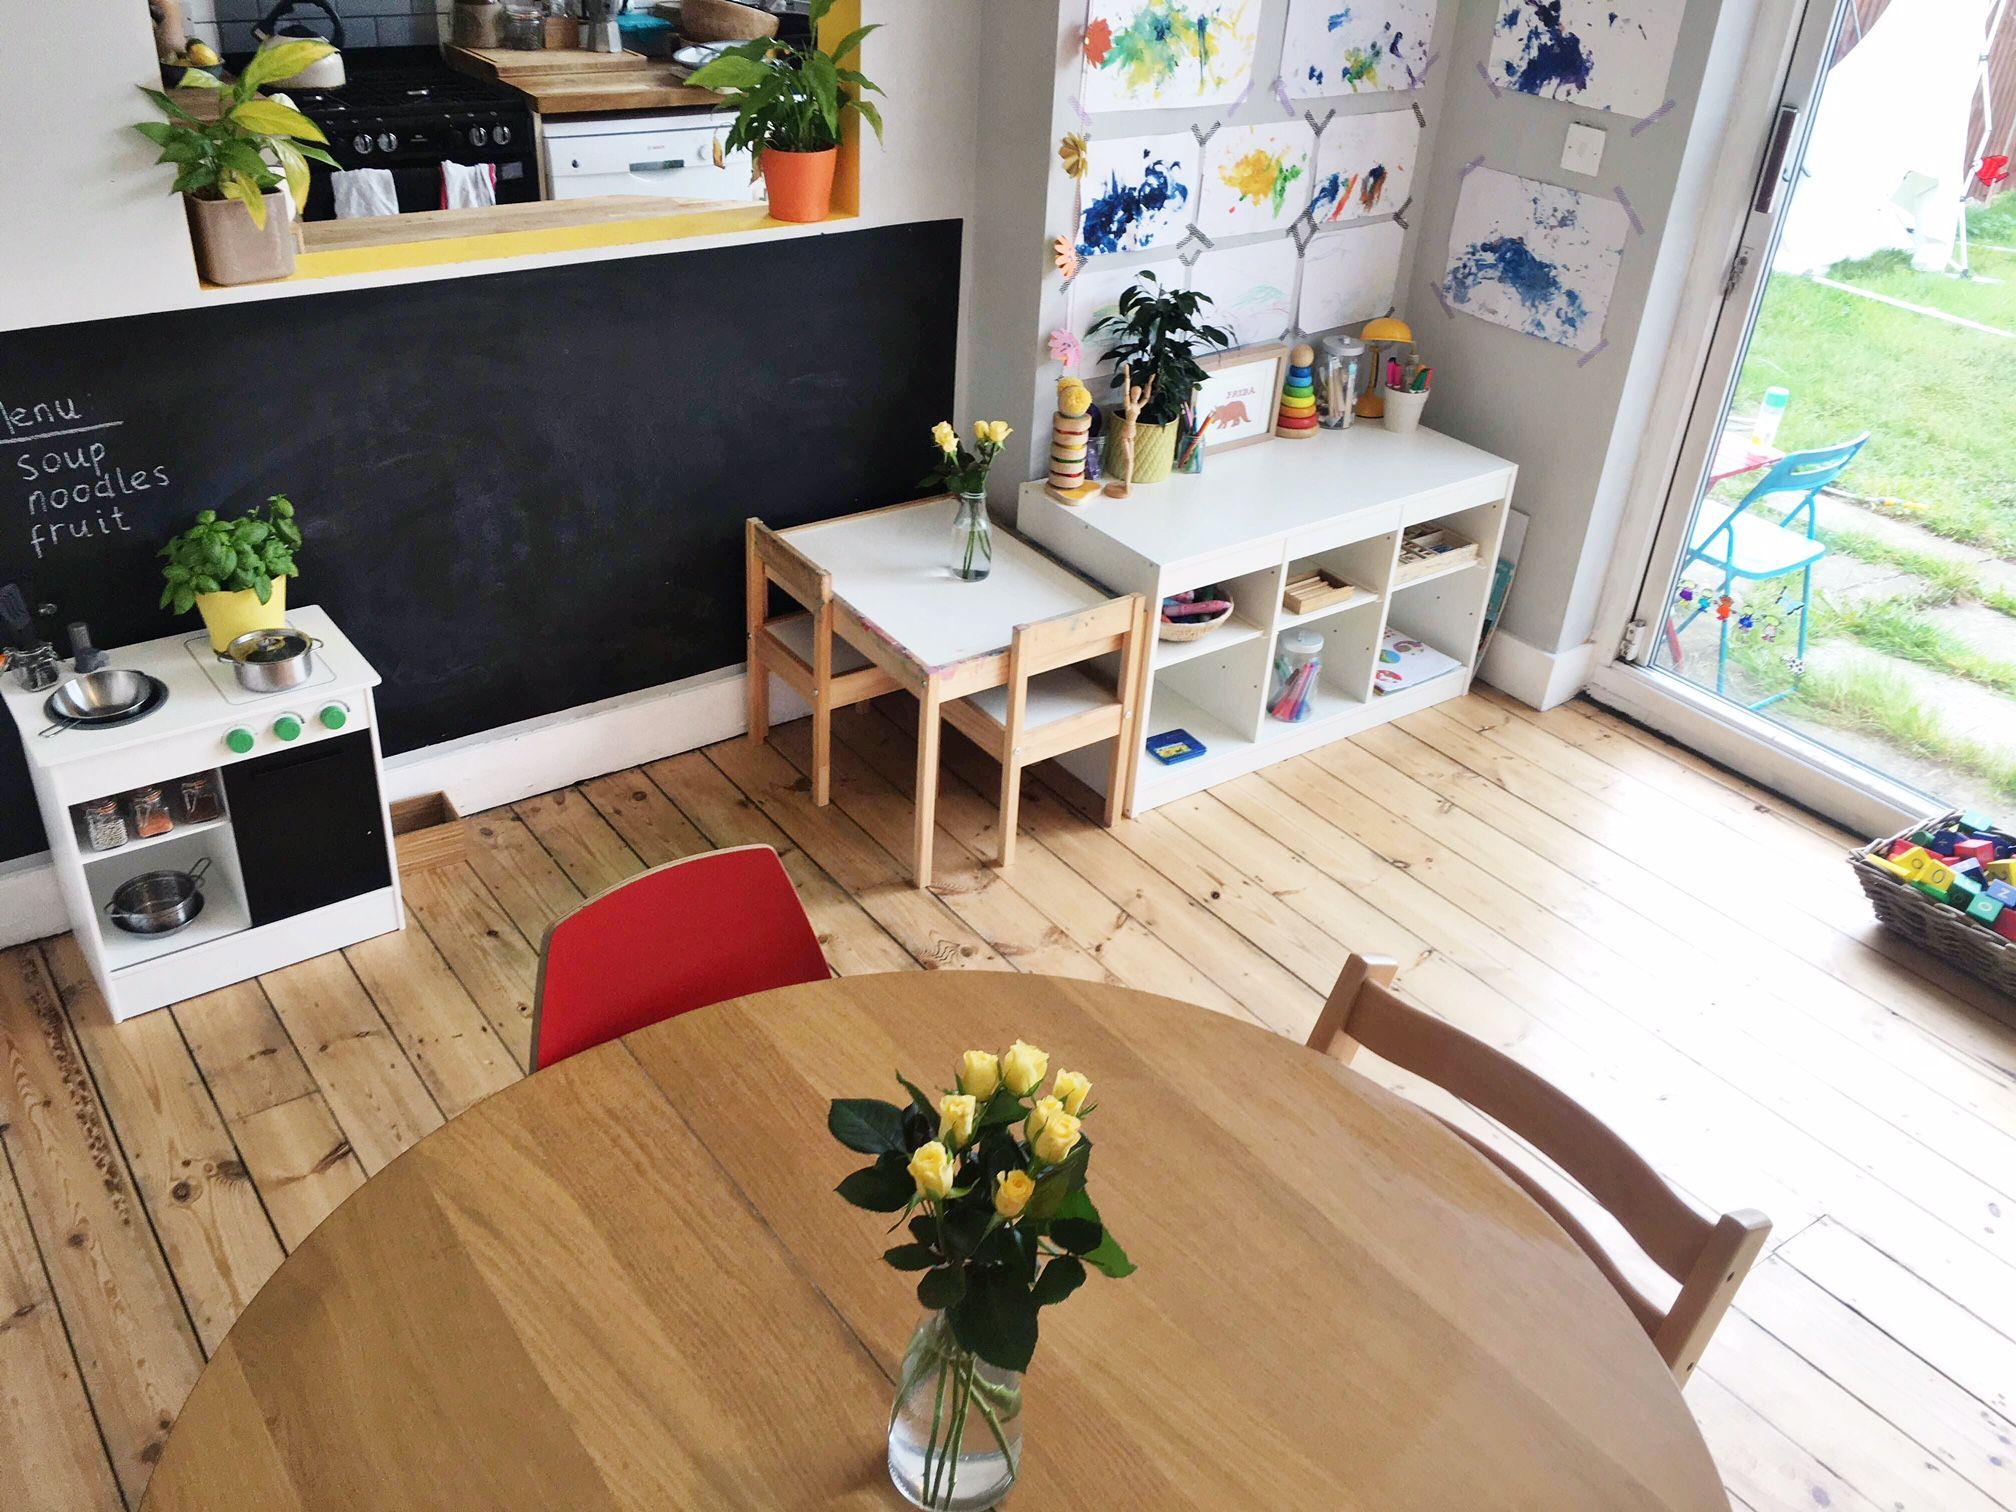 A Peek Inside Eloise Sam And Frida S Montessori Style Home In London The Montessori Notebook Montessori Bedroom Montessori Playroom Toddler Bedrooms